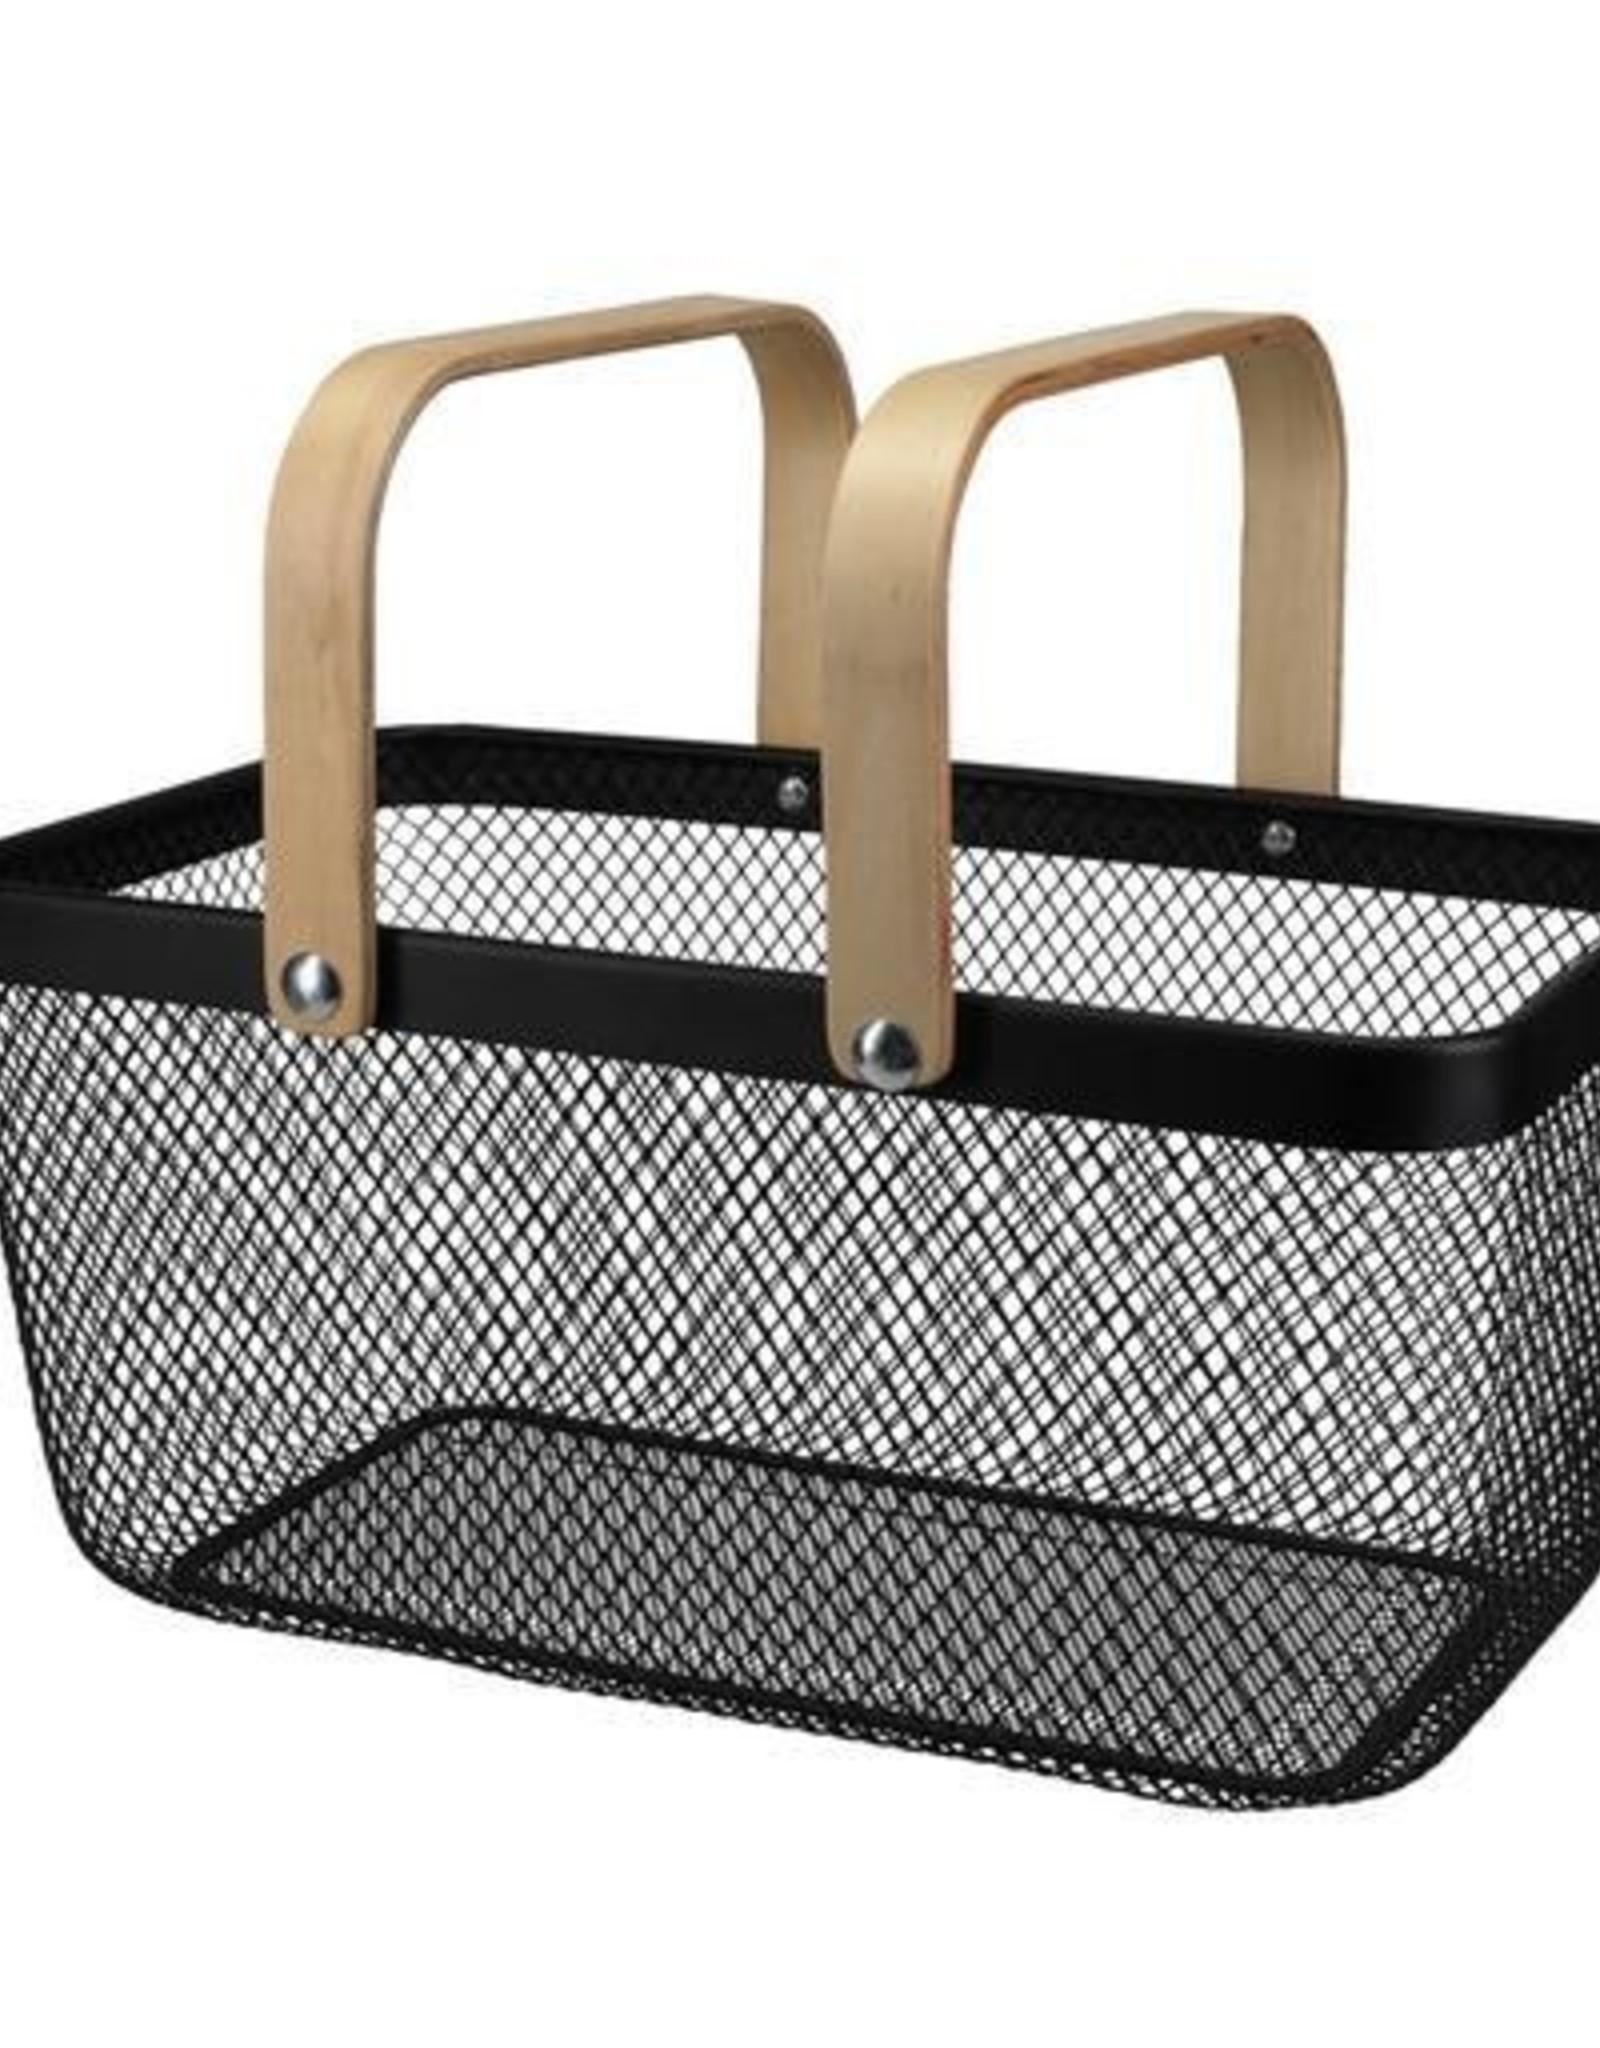 Natural Living Market Basket, Black Wire Mesh w/Bamboo Handle 41x21cm